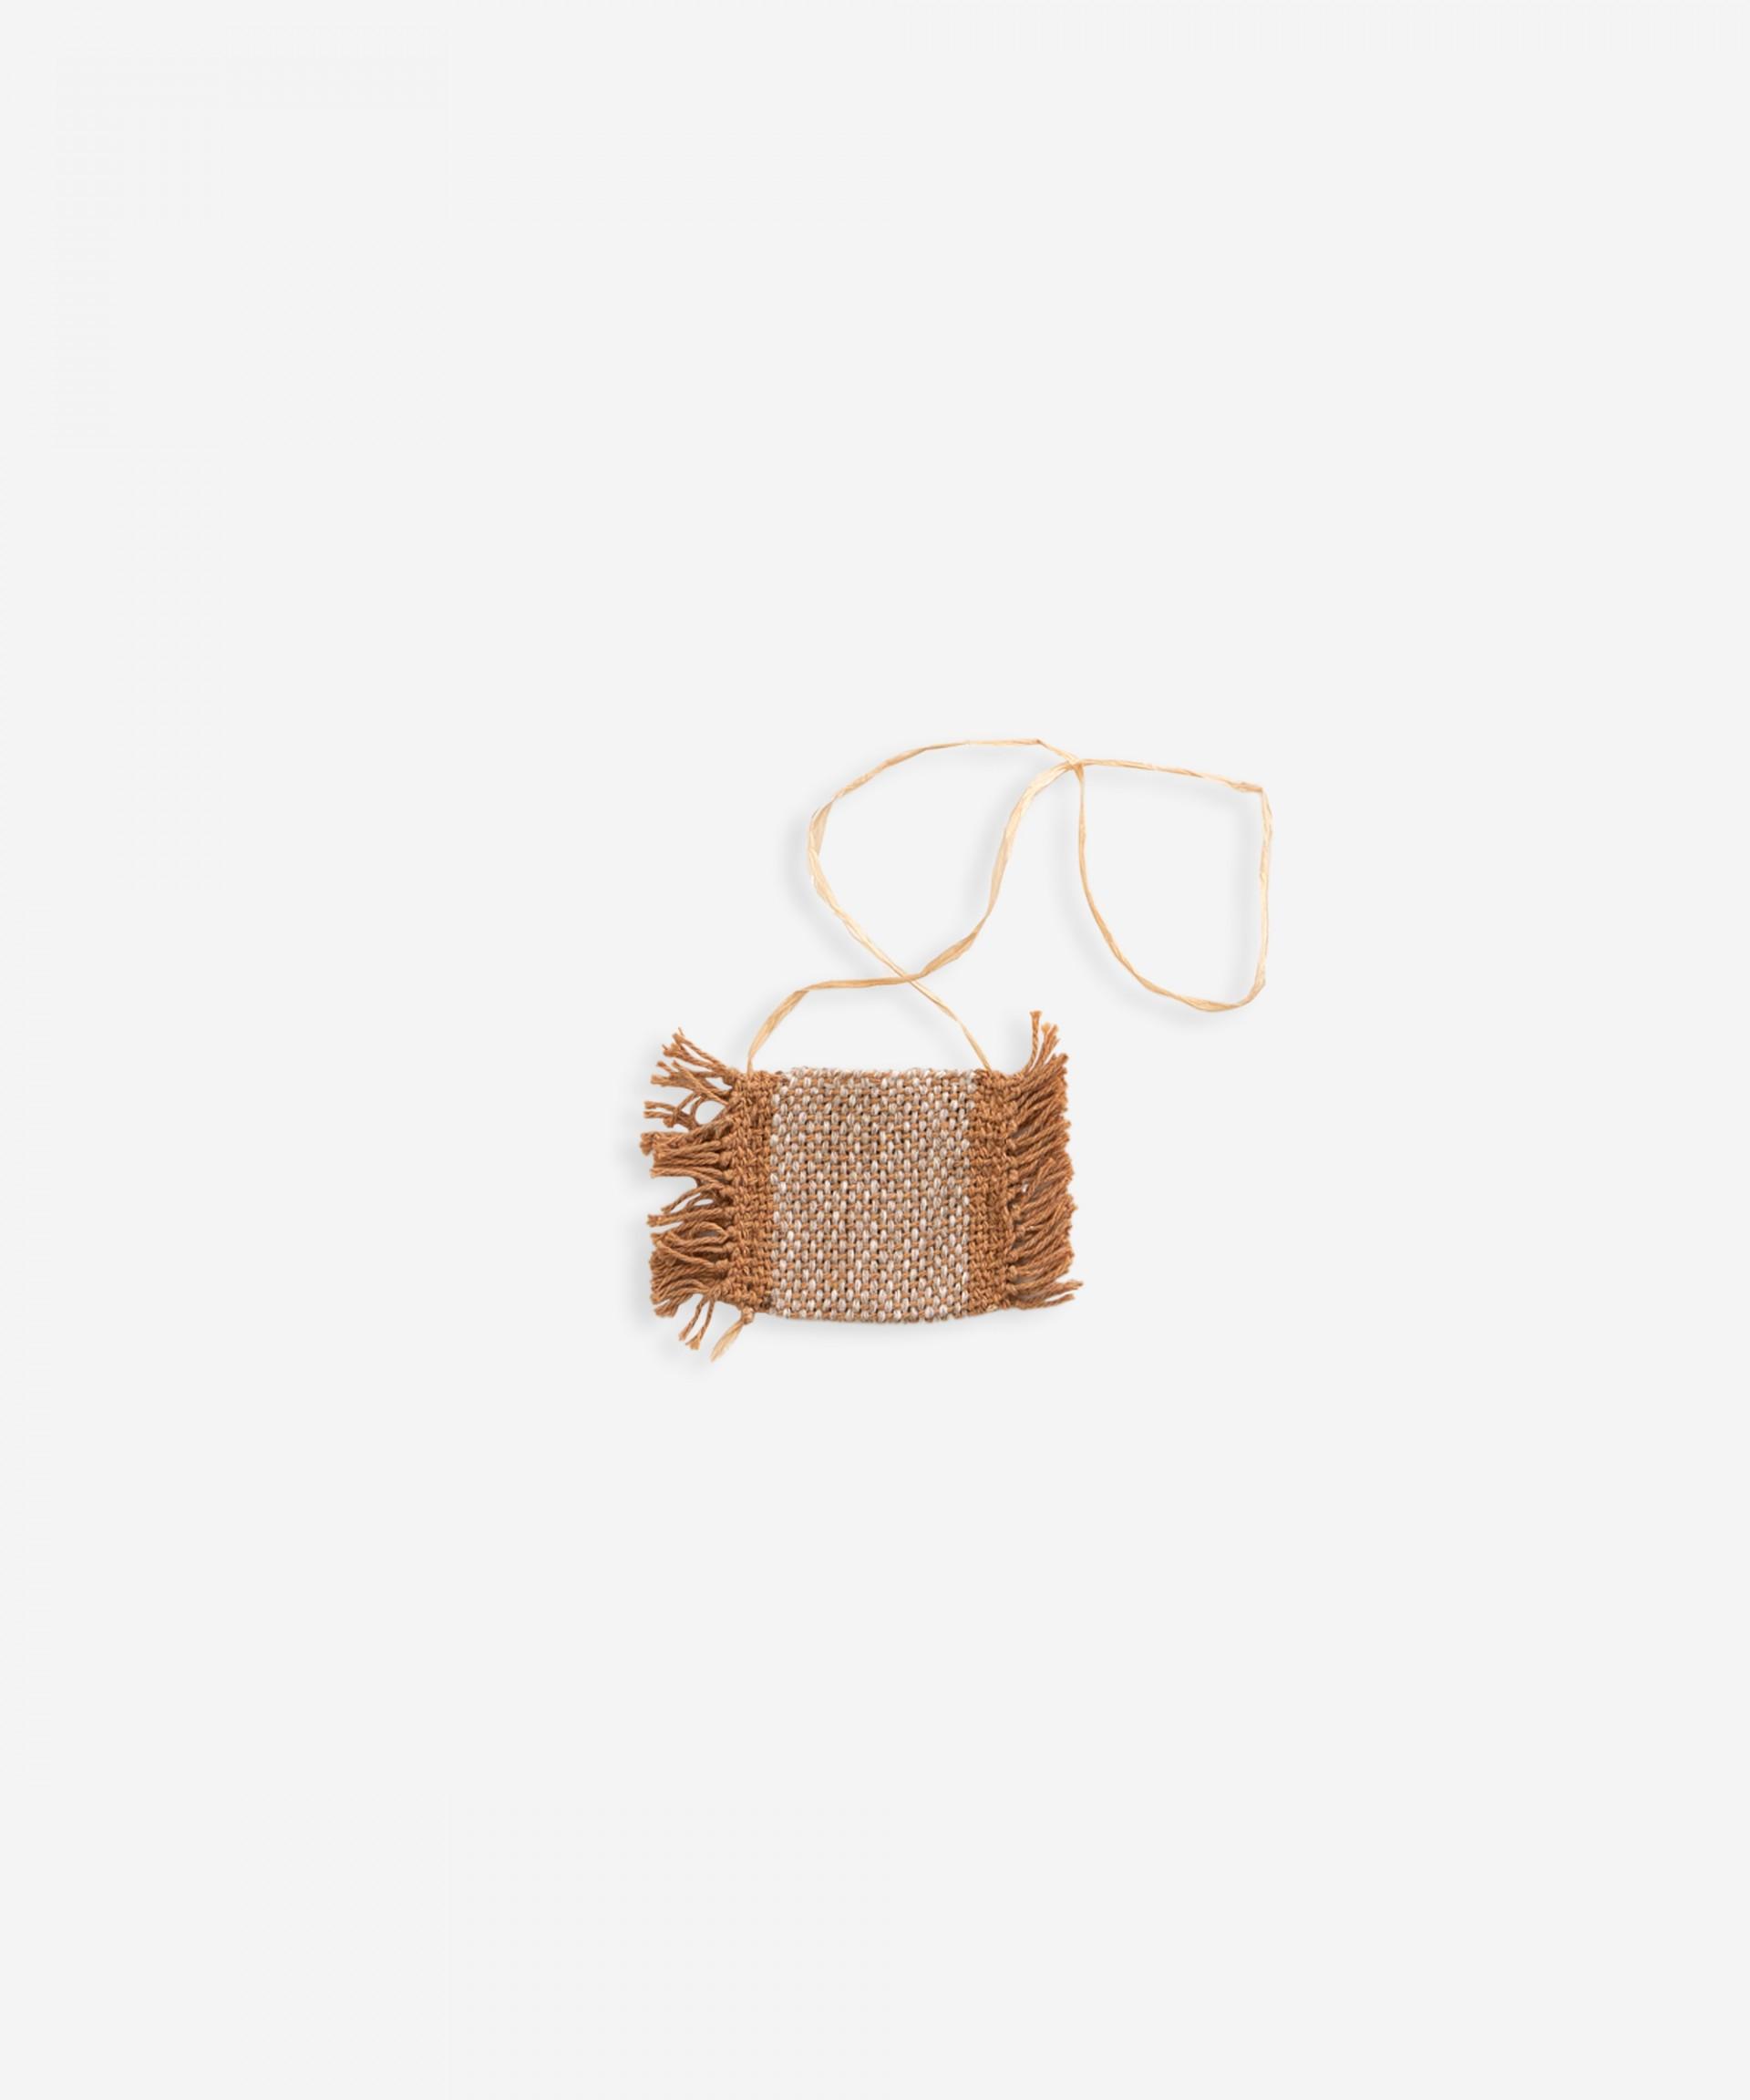 Bag | Weaving